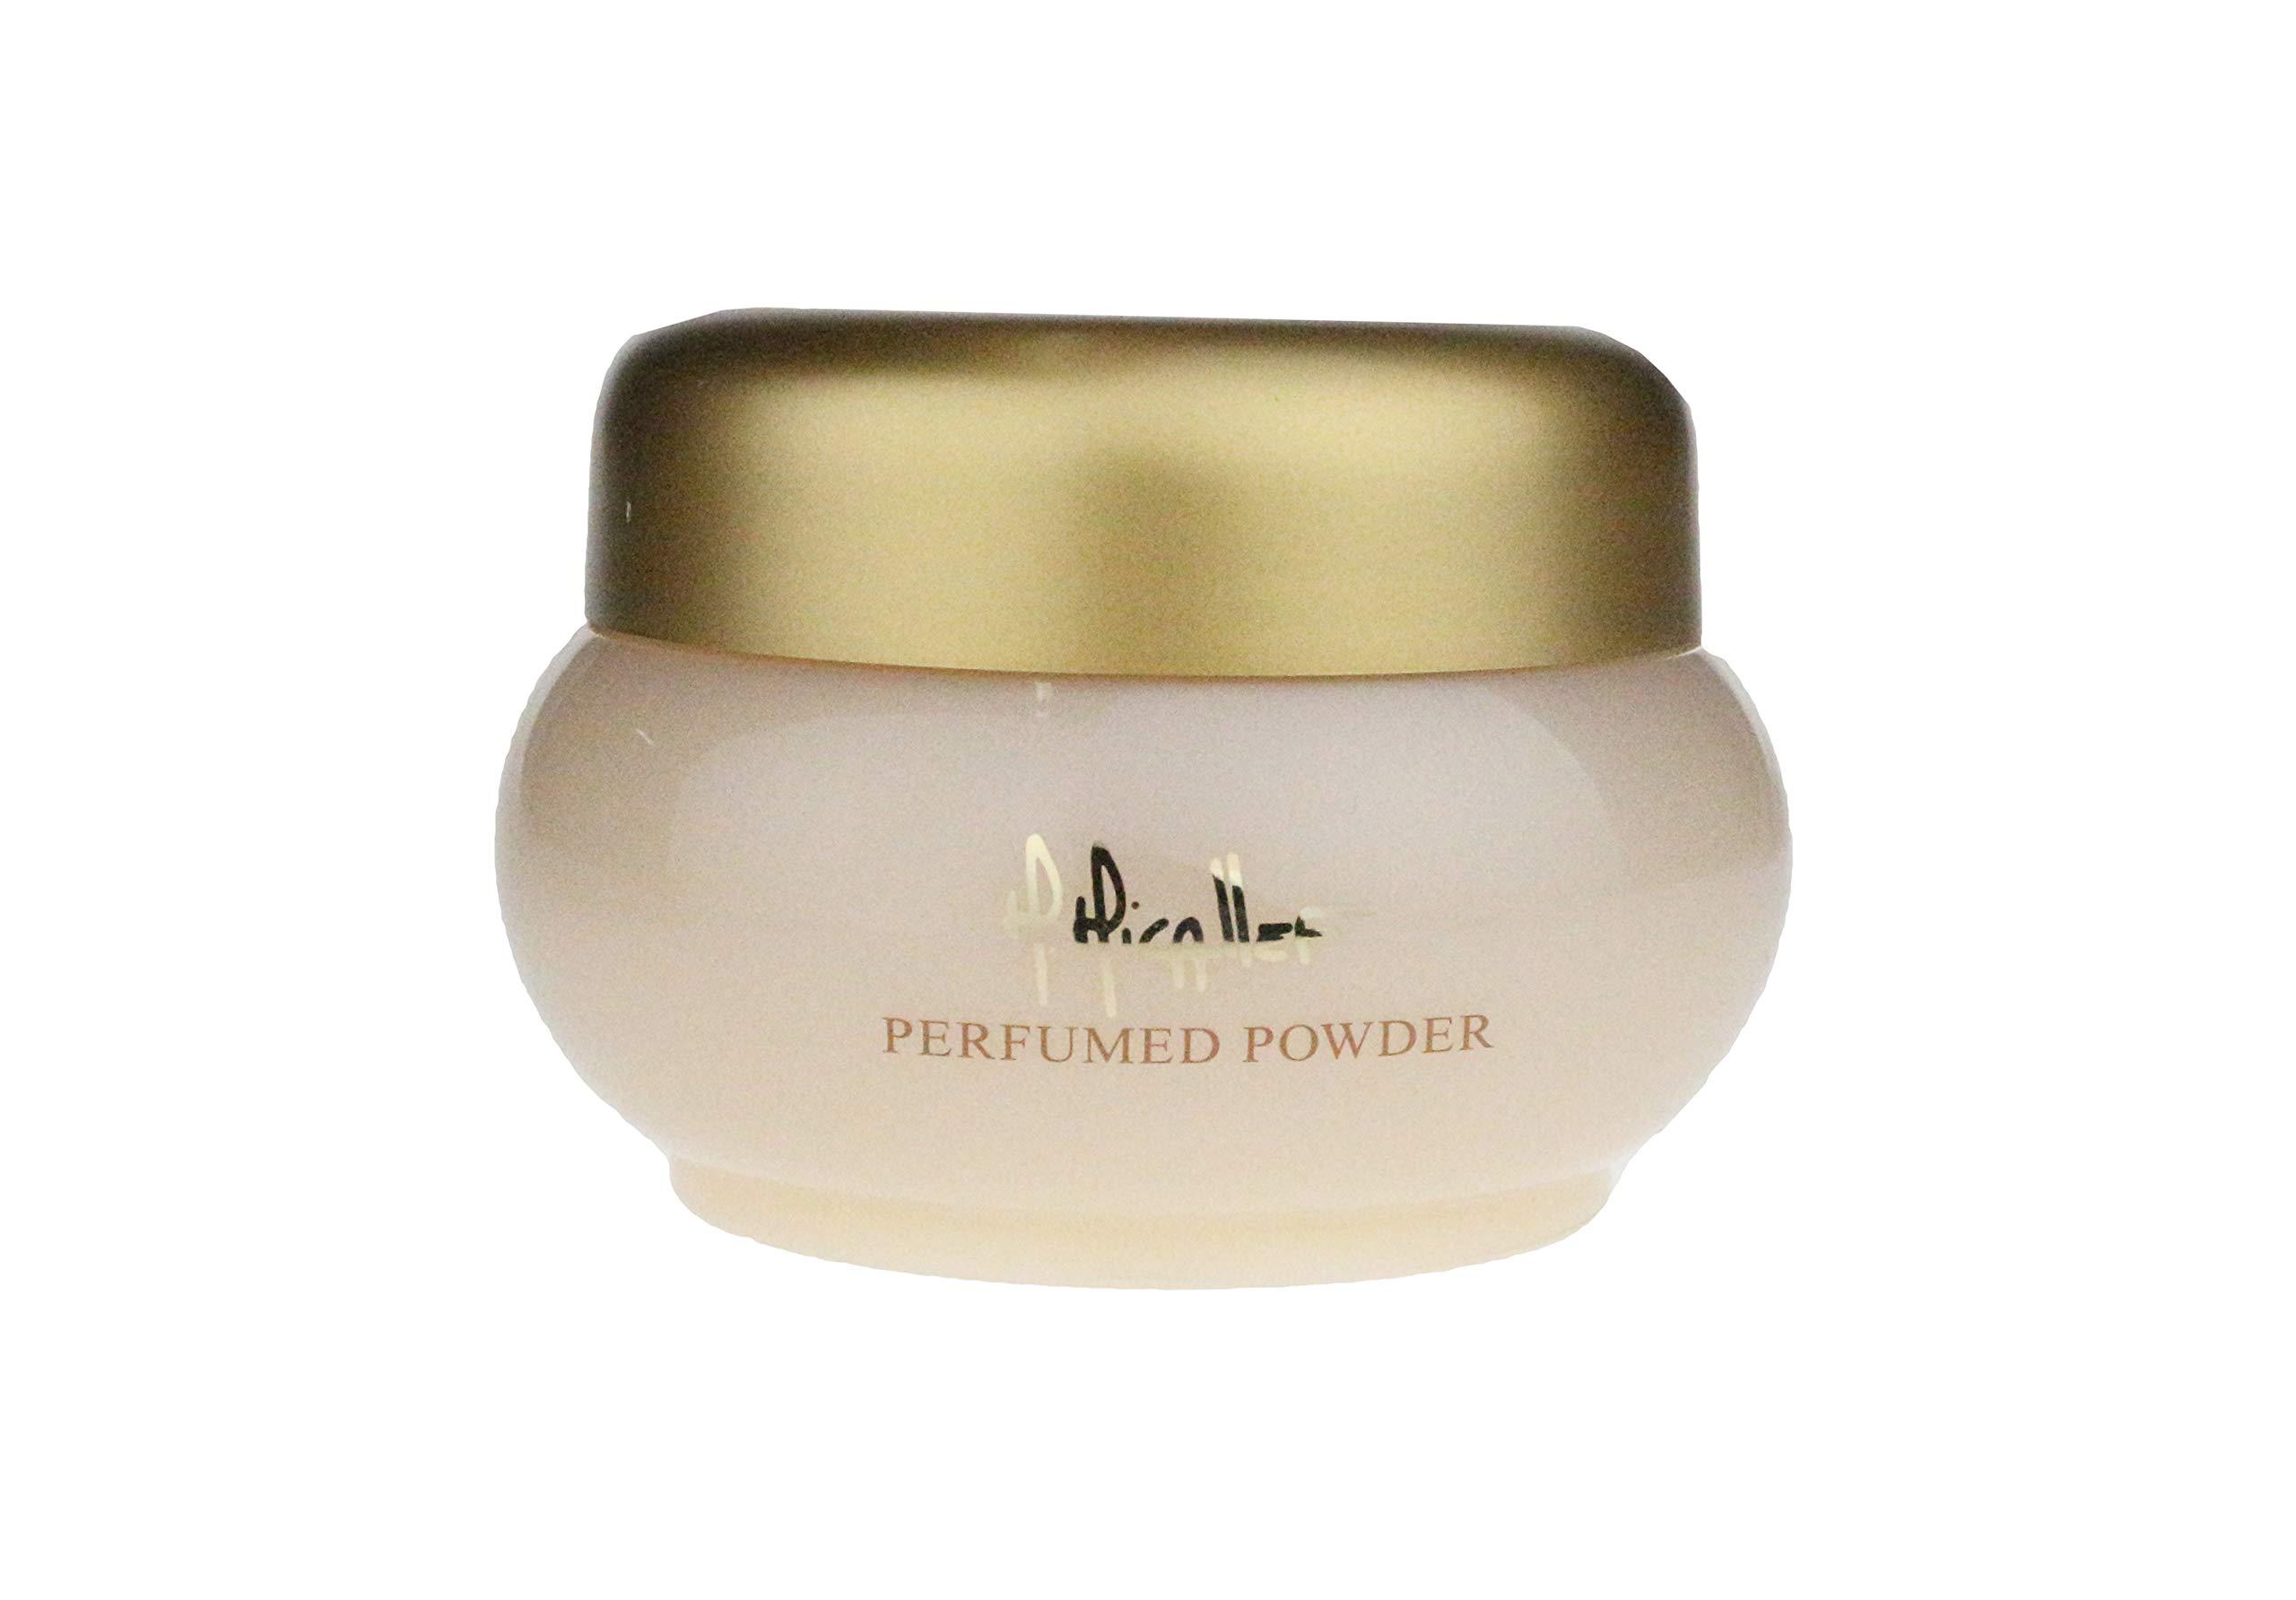 Micallef 'Rose Aoud' Perfumed Powder 4.75oz/125g New In Box